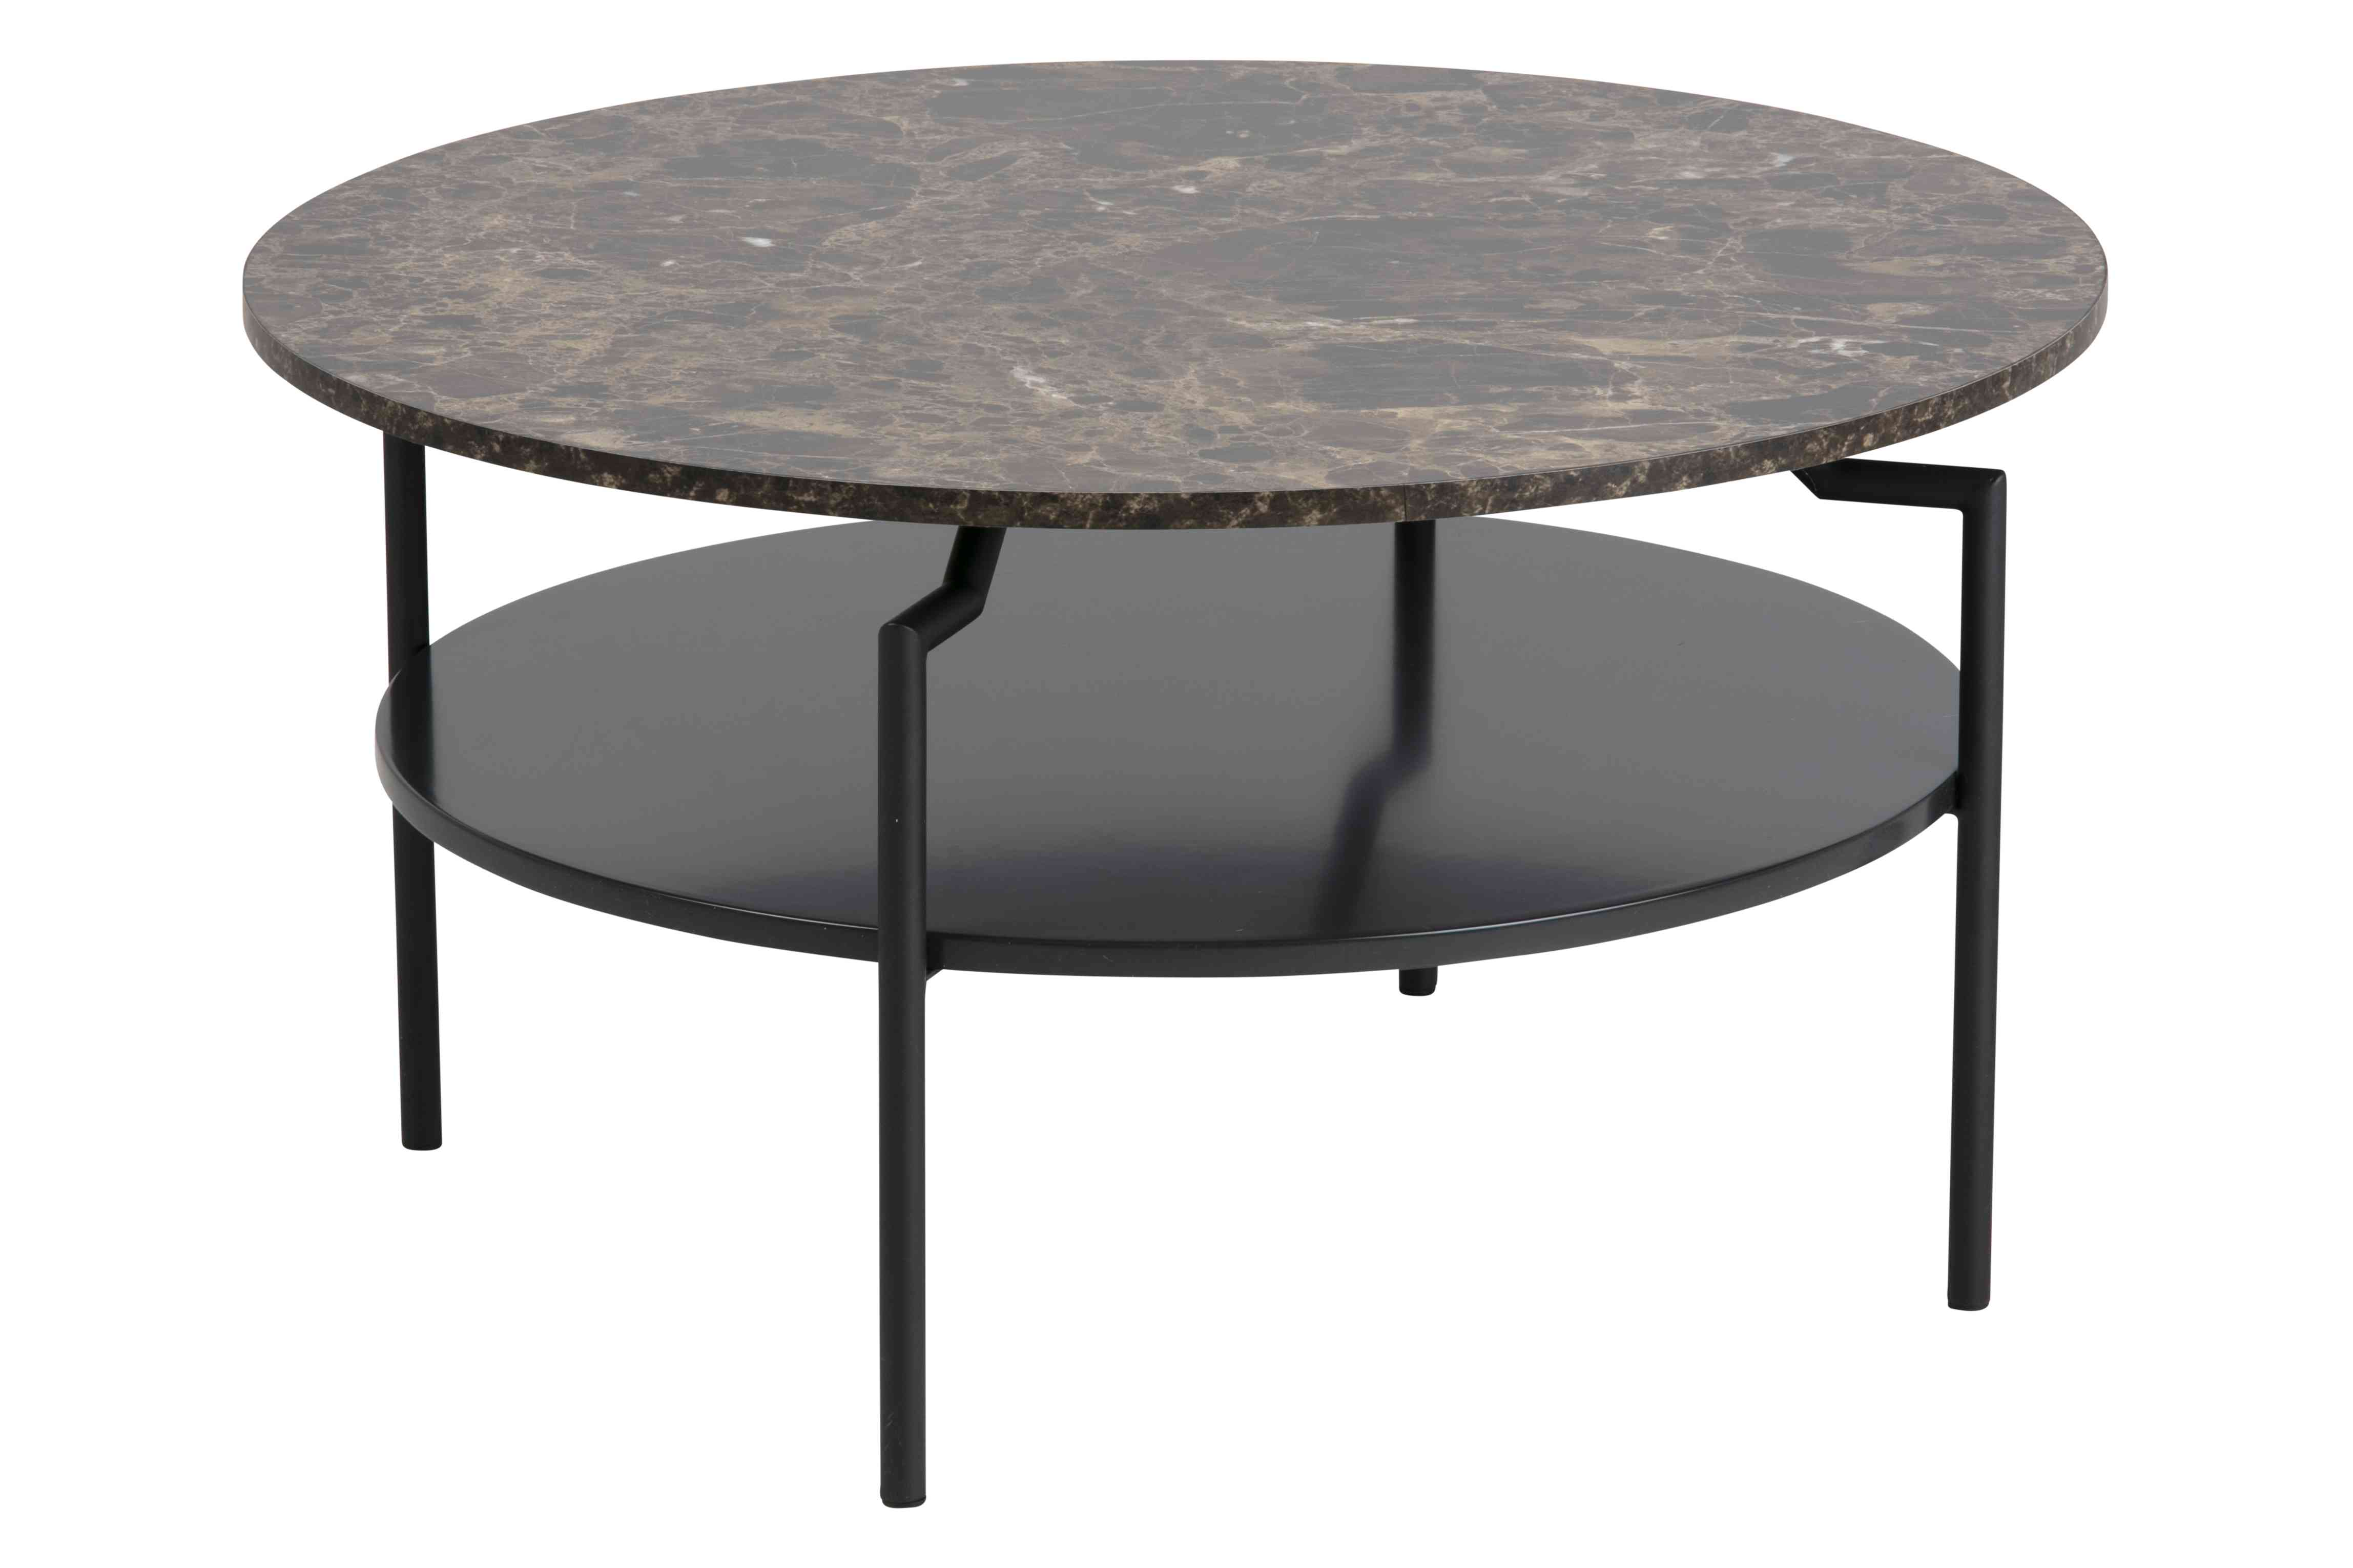 Goldington sofabord - brun/sort marmorpapir/MDF, rund (Ø80)